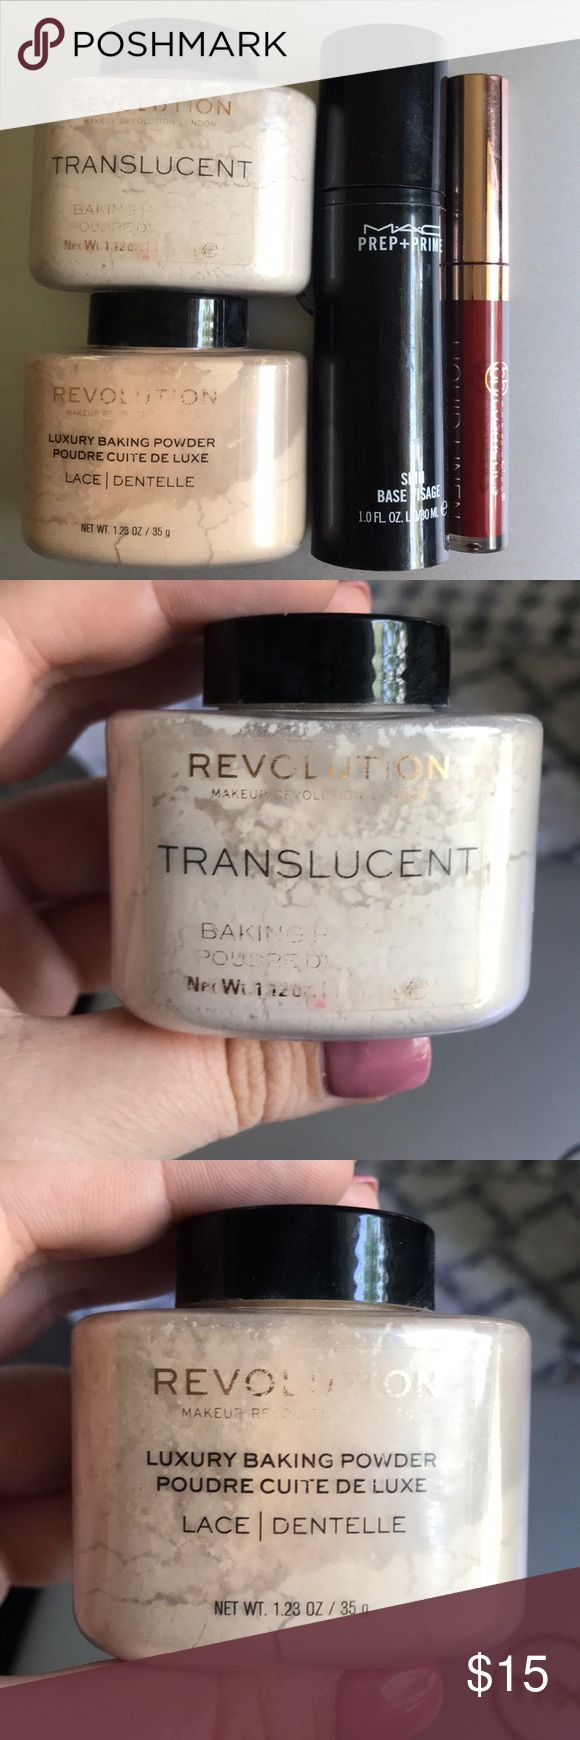 Makeup Revolution Ghost Baking Powder Review Mae Polzine